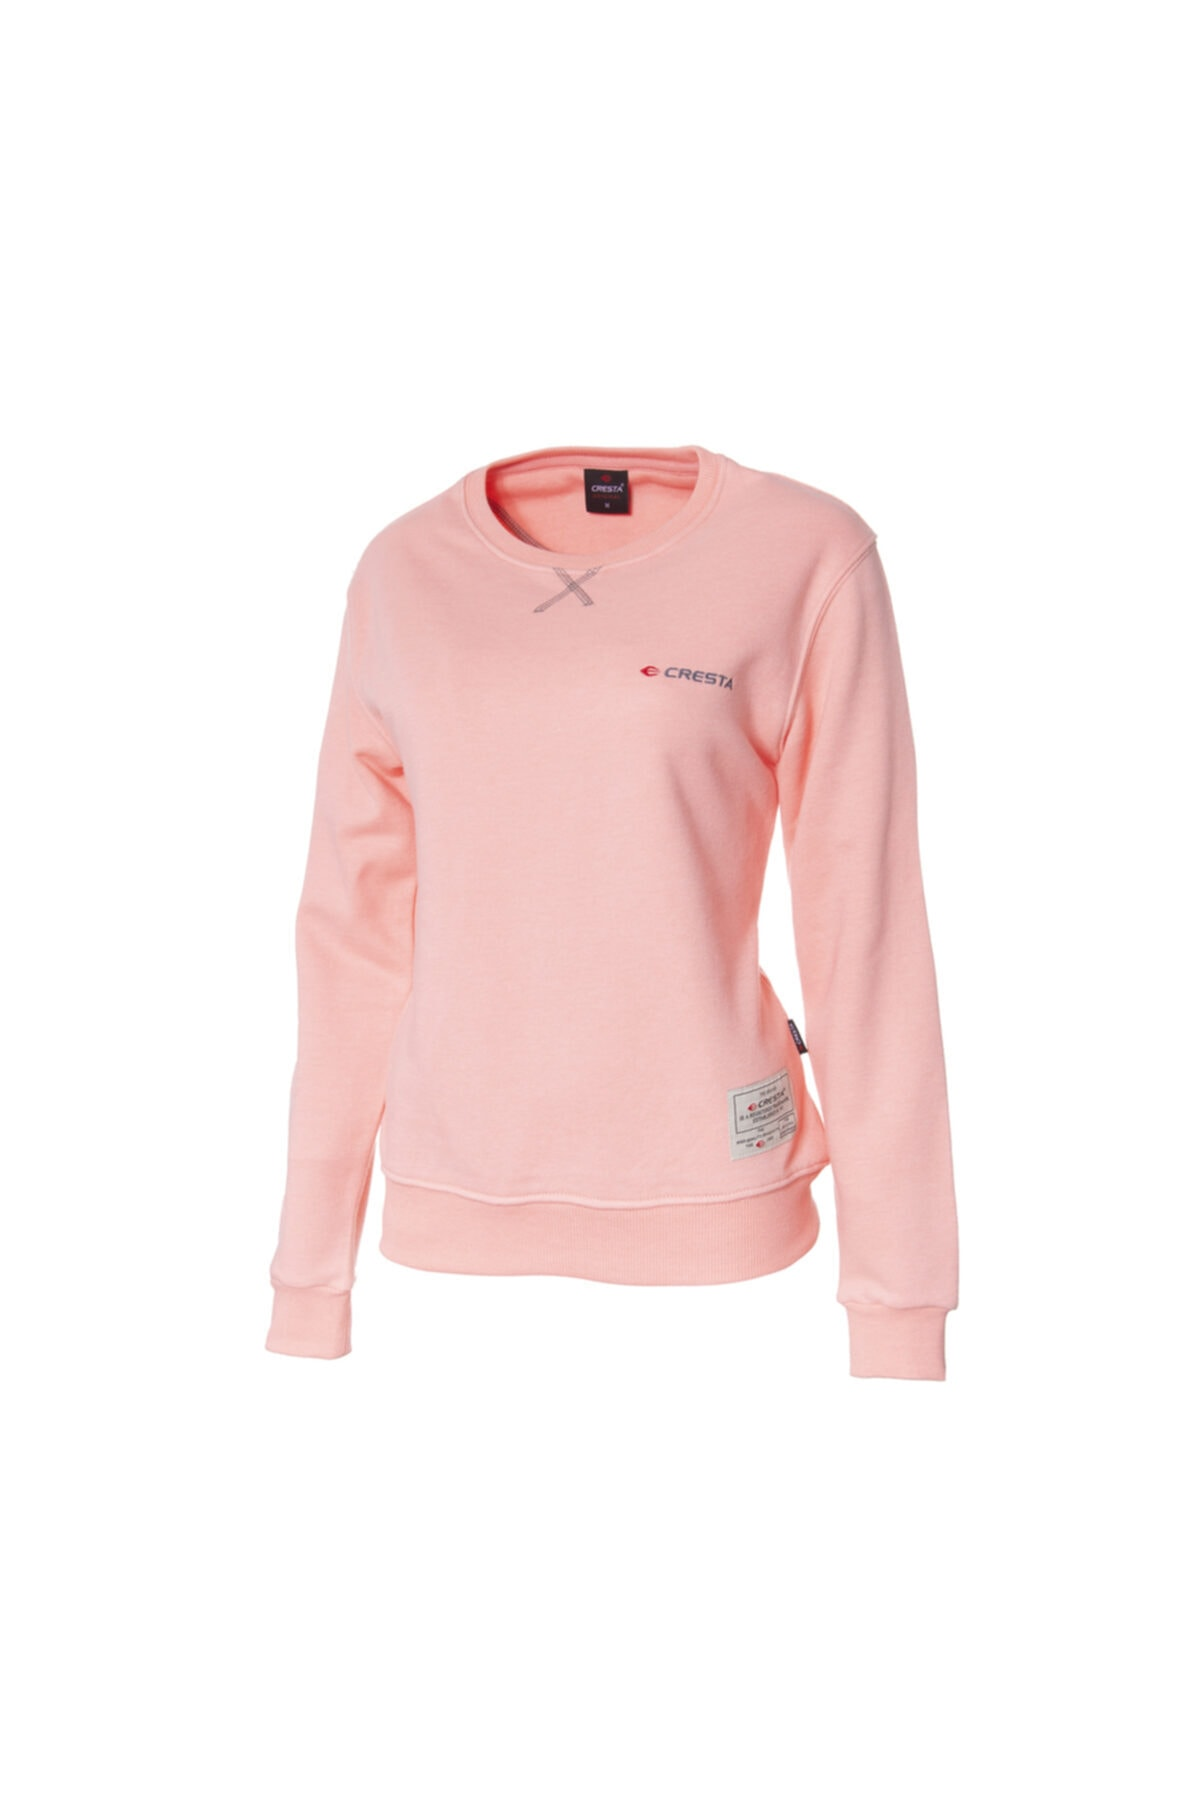 Cresta Kadın Pembe Outdoor Basic Sweatshirt 1